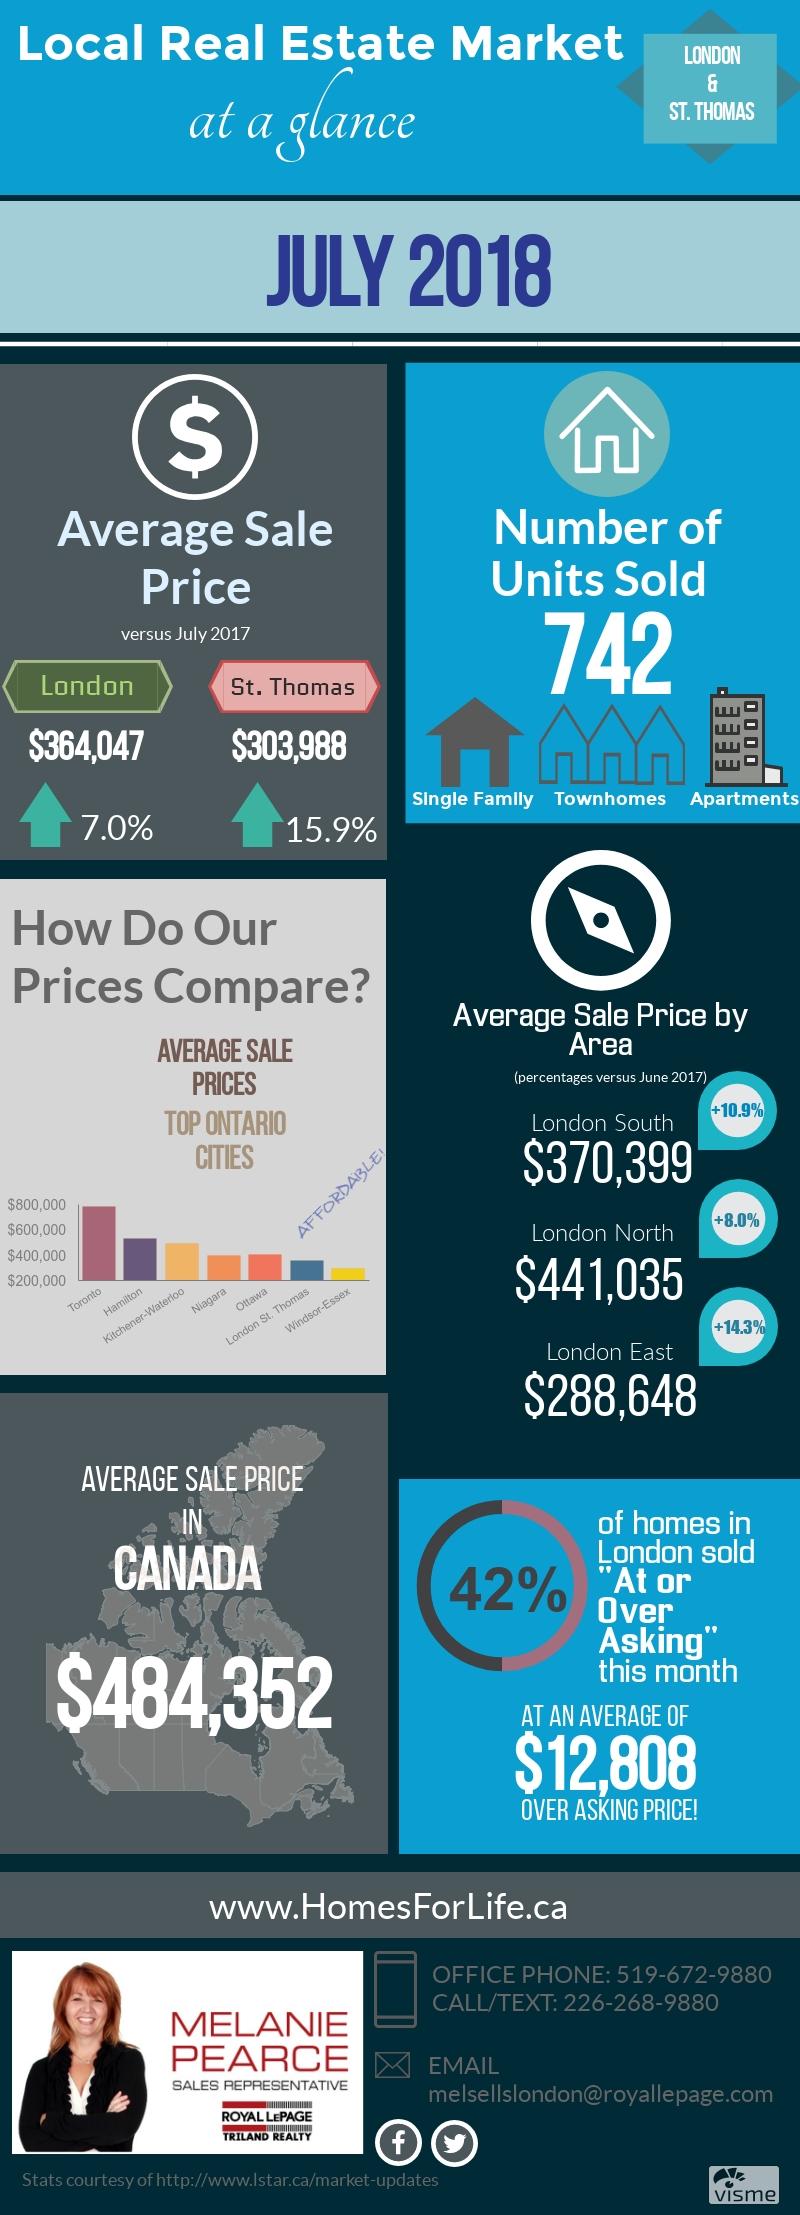 Melanie-Pearce-London-Ontario-Real-Estate-Market-Stats-July-2018.jpg